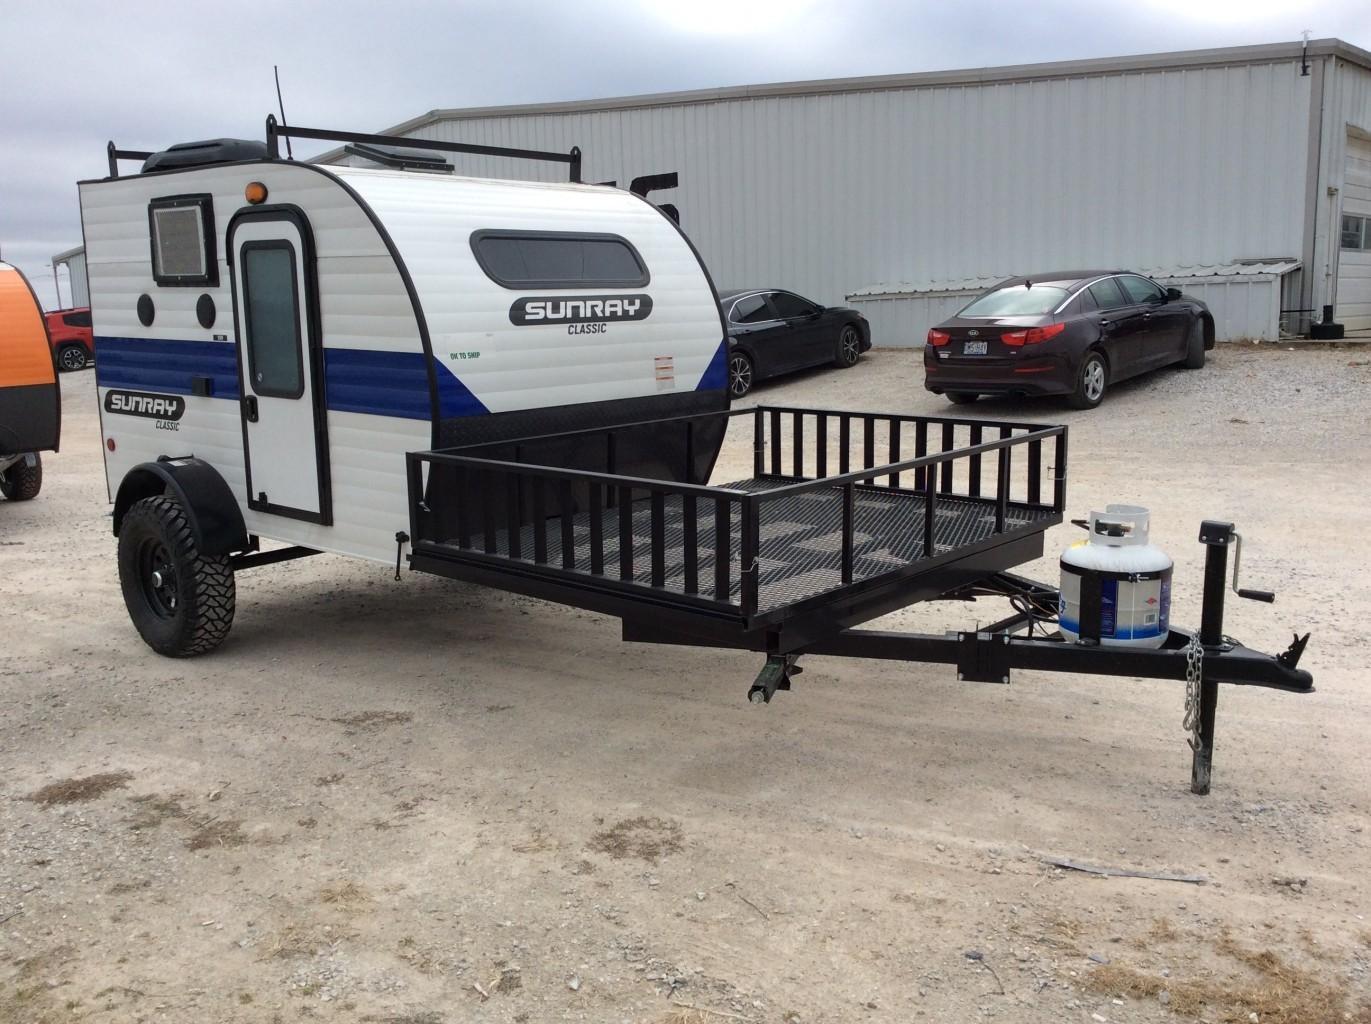 RV Dealer in Missouri - Forest River, Prime Time, Cruiser RV & more